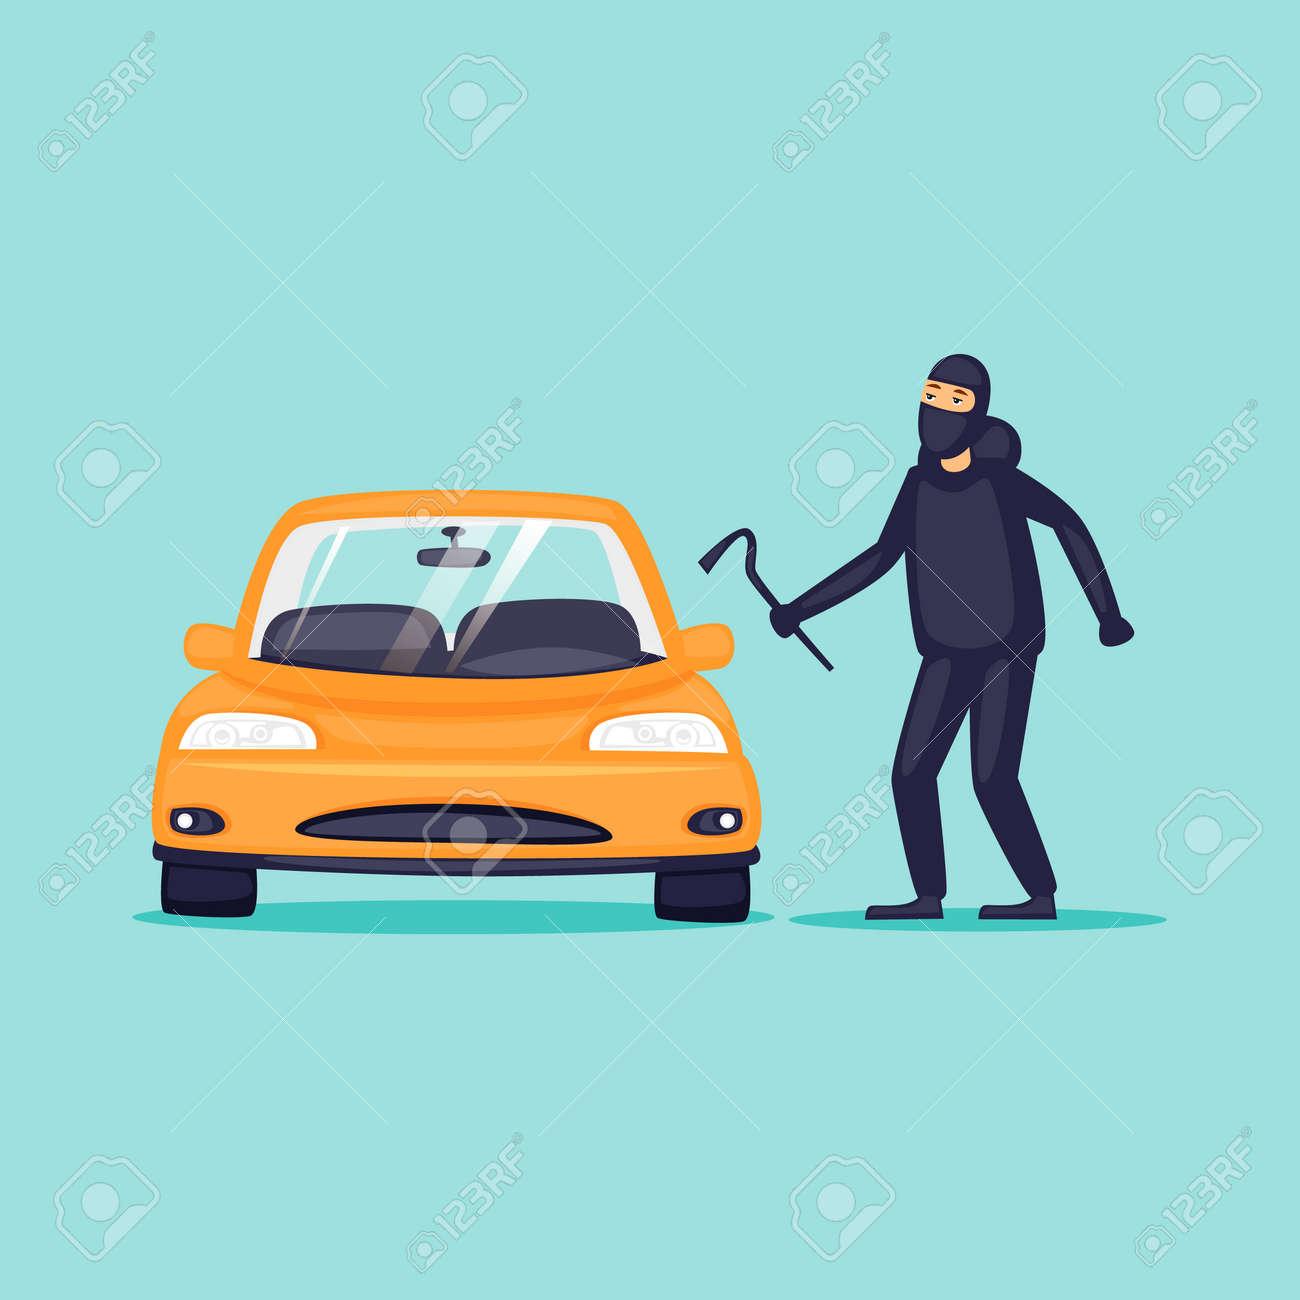 Thief steals cars, insurance. Flat design vector illustration. - 92949307